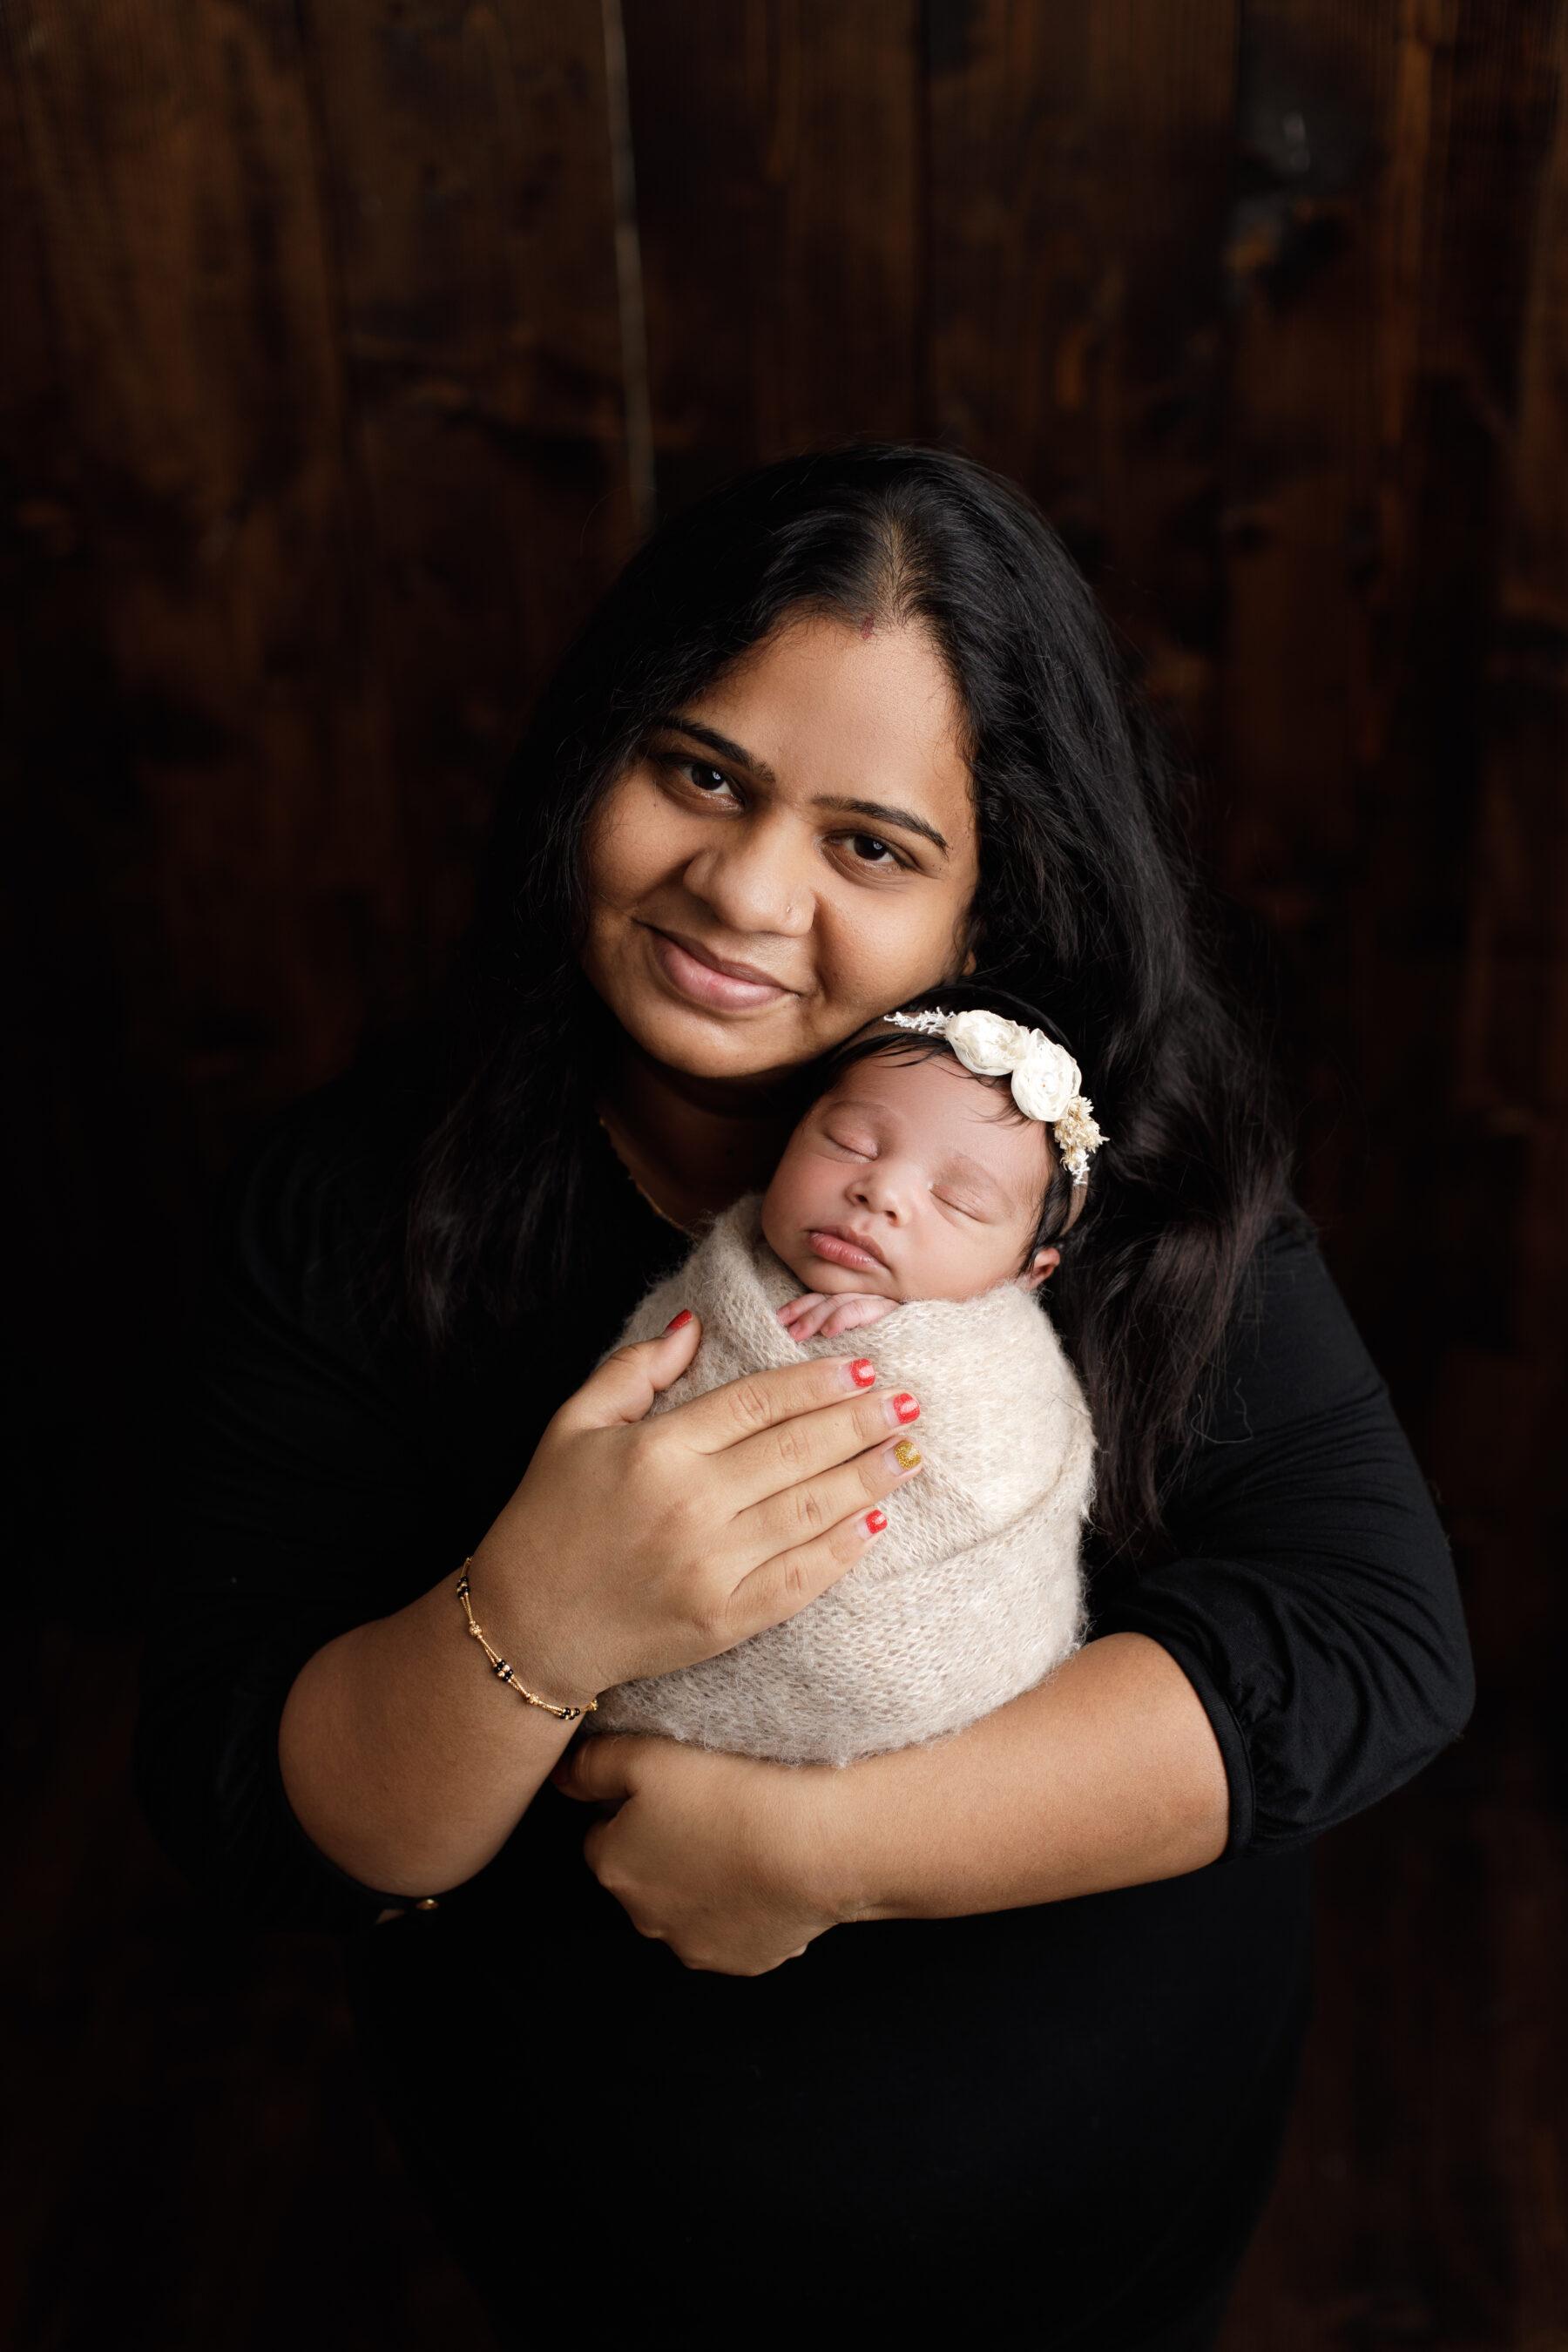 Nashville Newborn Session from Evie Lynn Photography   Nashville Baby Guide